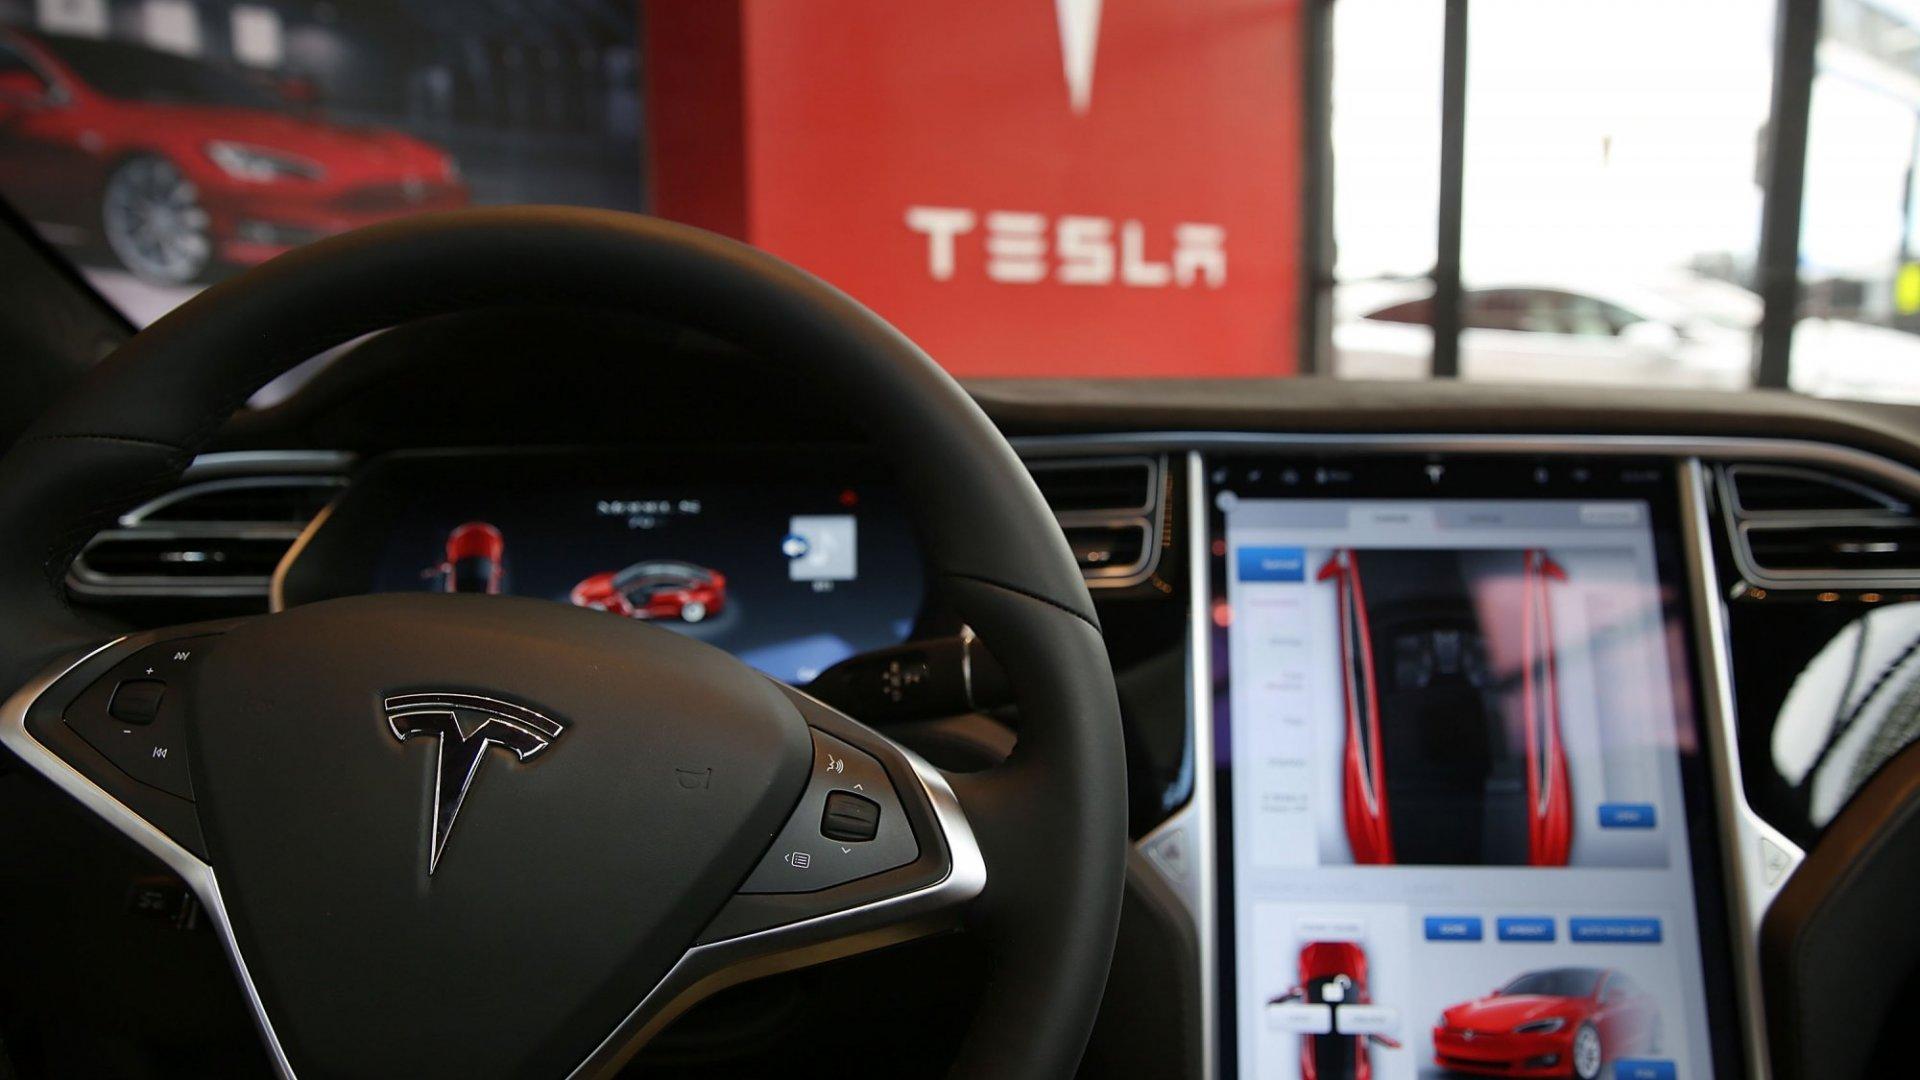 Tesla Updates Autopilot Software, Claims New Technology Could Have Prevented Fatal Crash